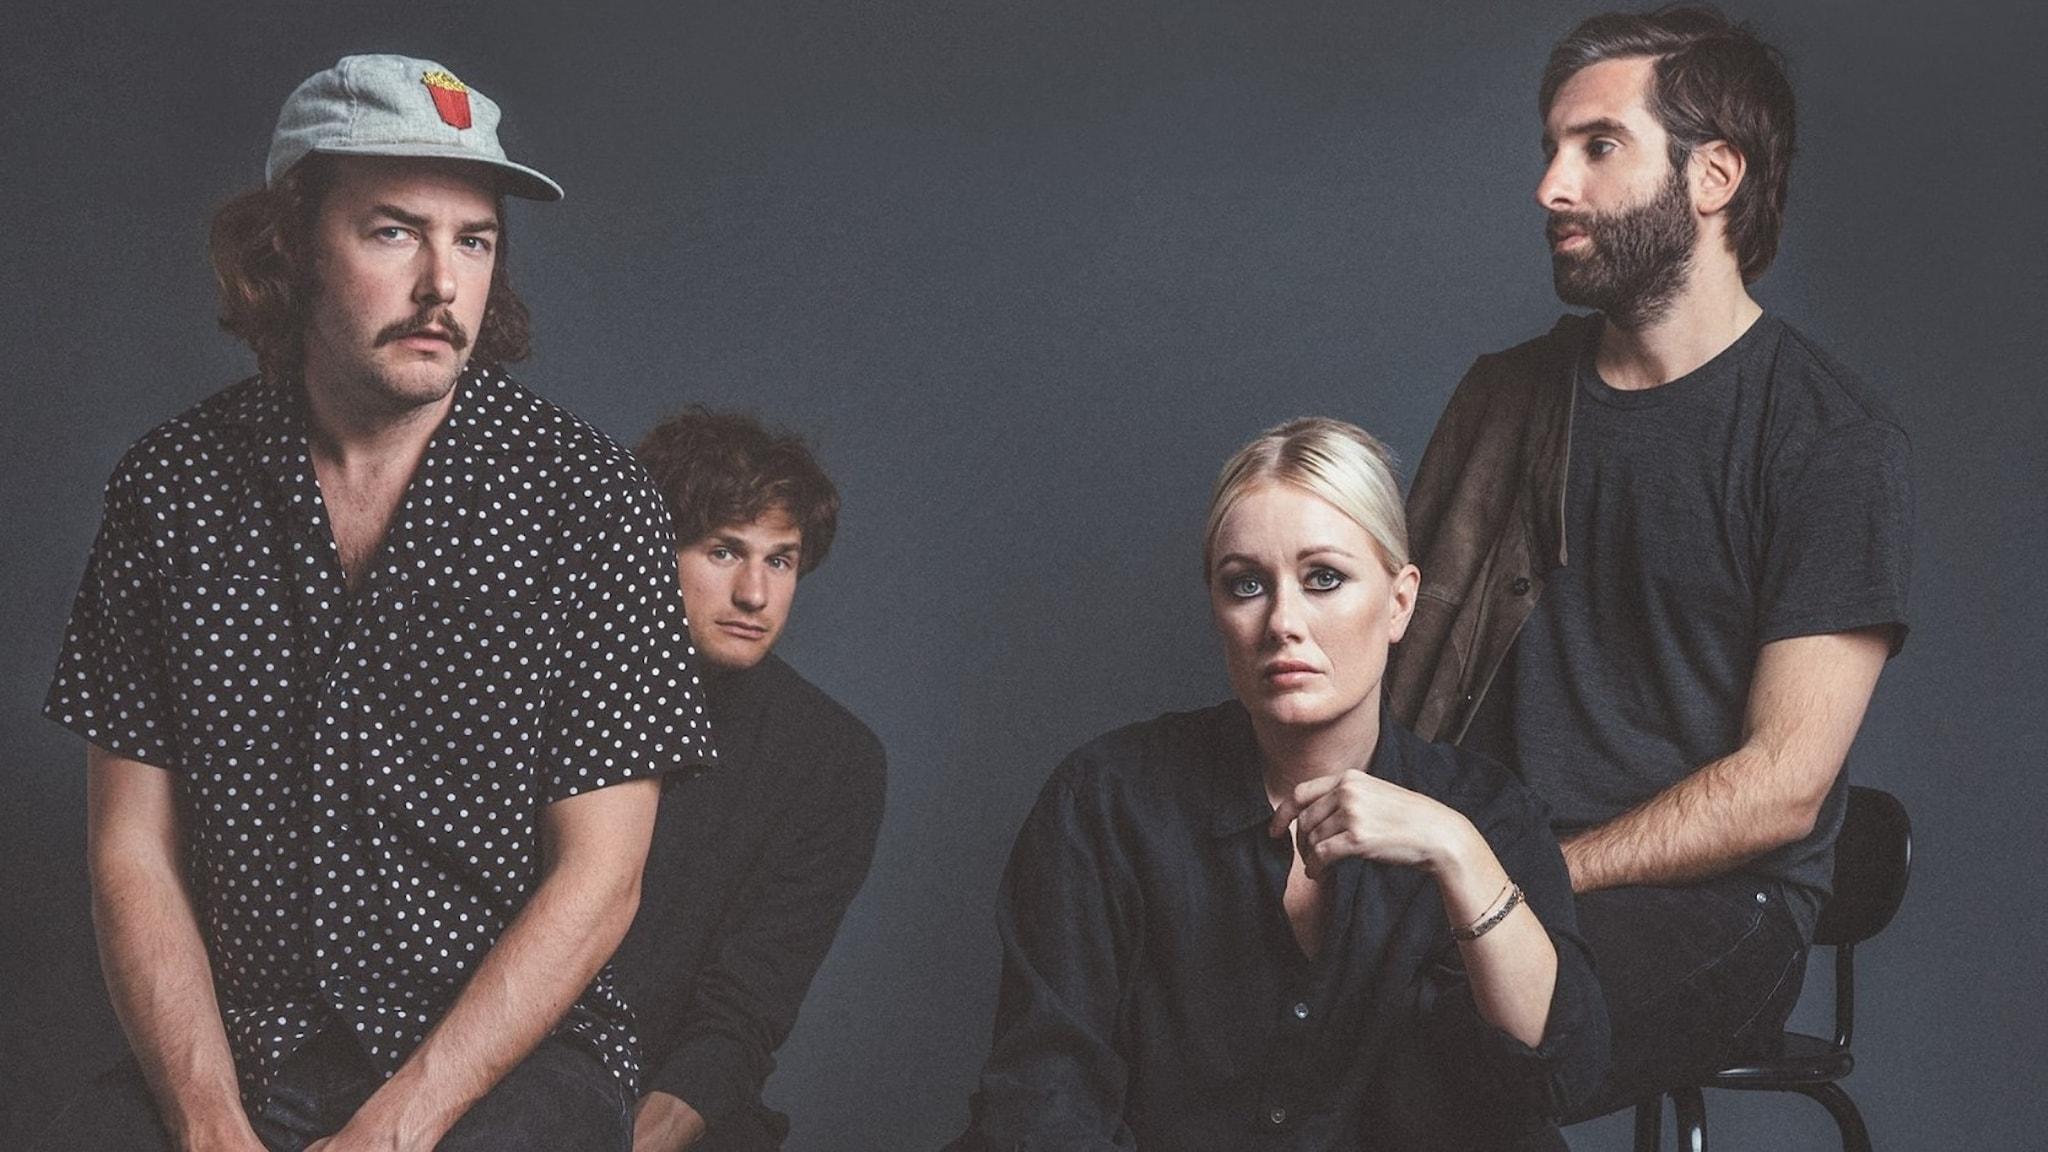 Fyra bandmedlemmar från Shout Out Louds syns på bild.